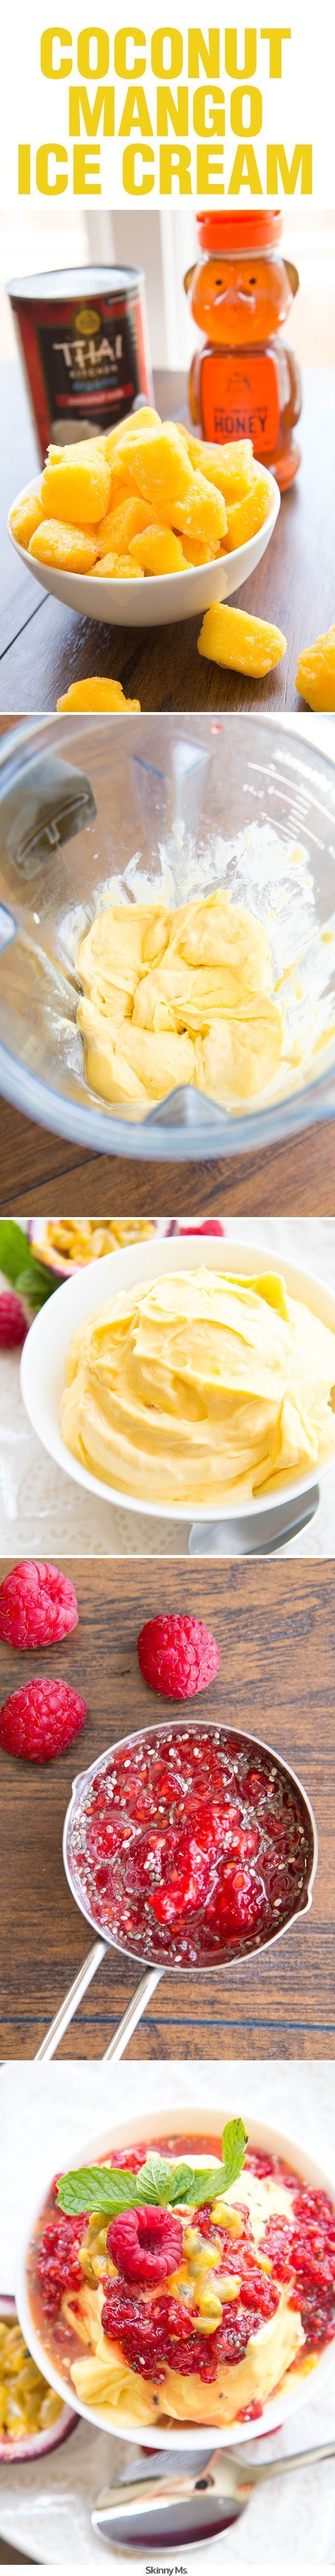 Make your own creamy, soft-serve style ice cream using just three ingredients: coconut milk, frozen fruit, and honey. #mangoicecream